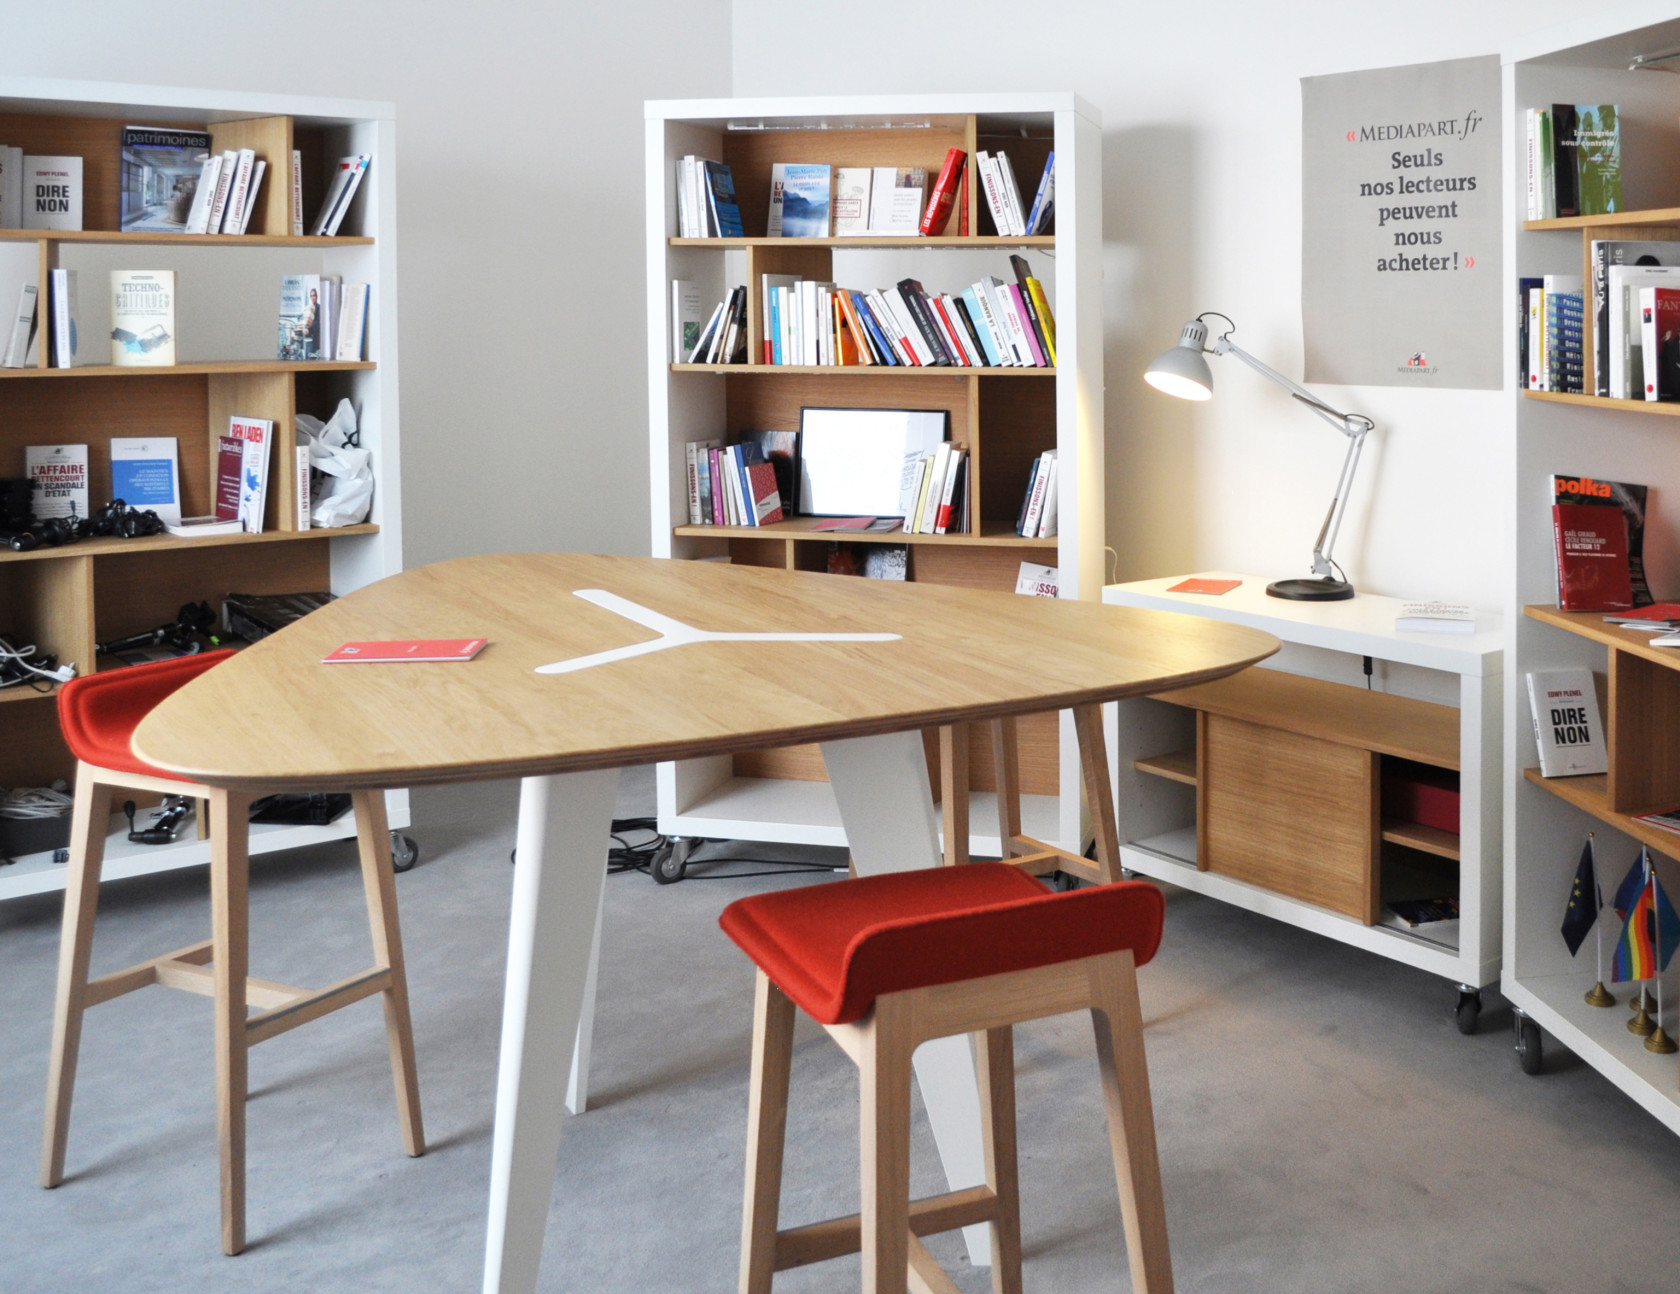 mediapart ludovic avenel b niste cr ateur paris. Black Bedroom Furniture Sets. Home Design Ideas